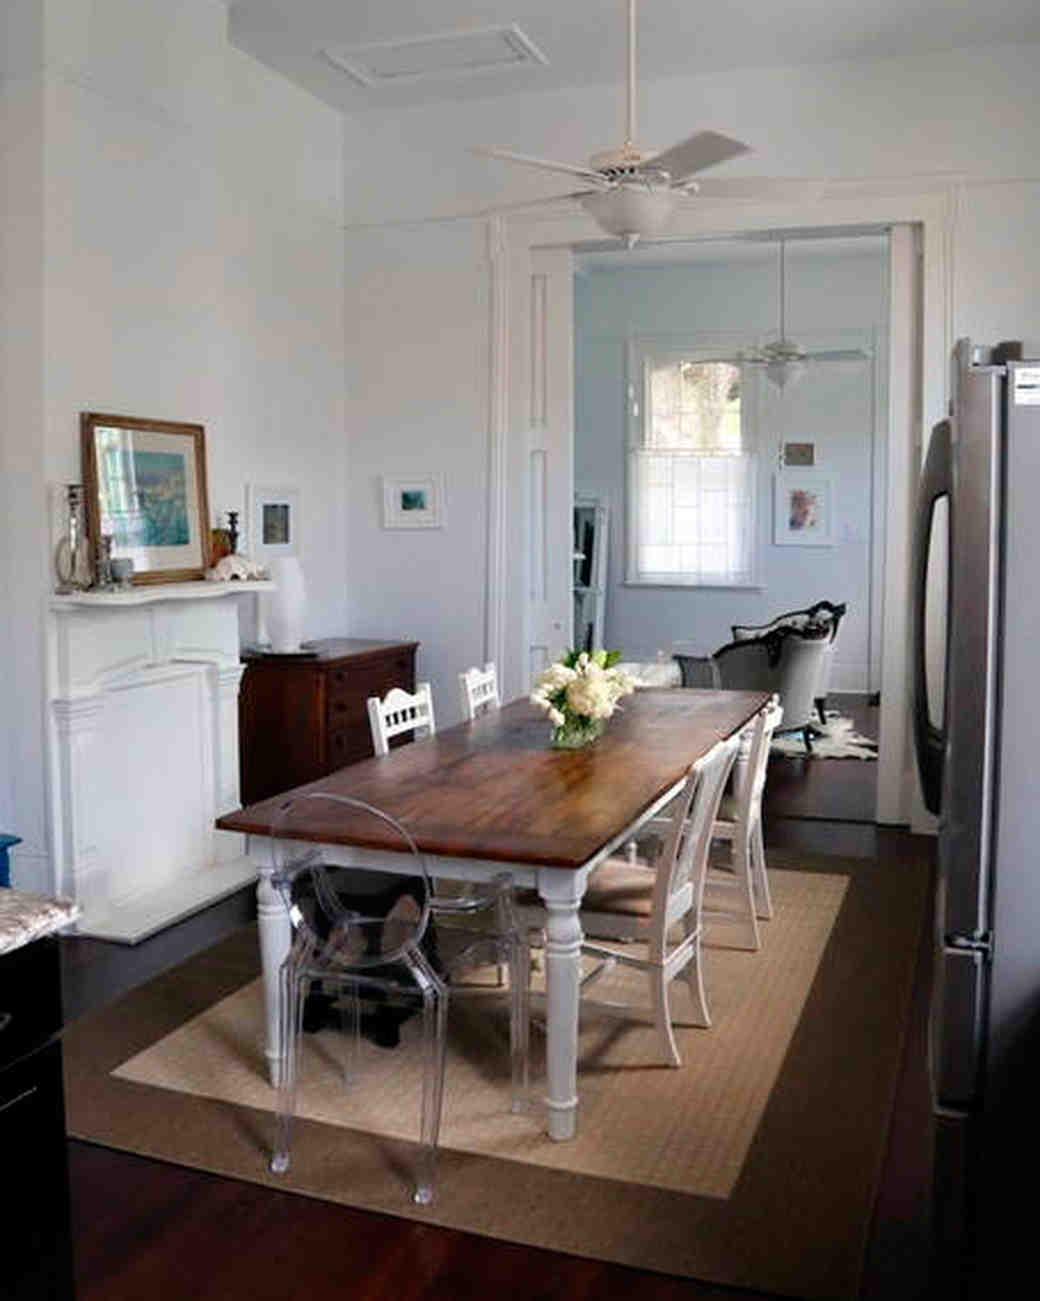 bachelorette-party-destinations-new-orleans-louisiana-airbnb-1215.jpg